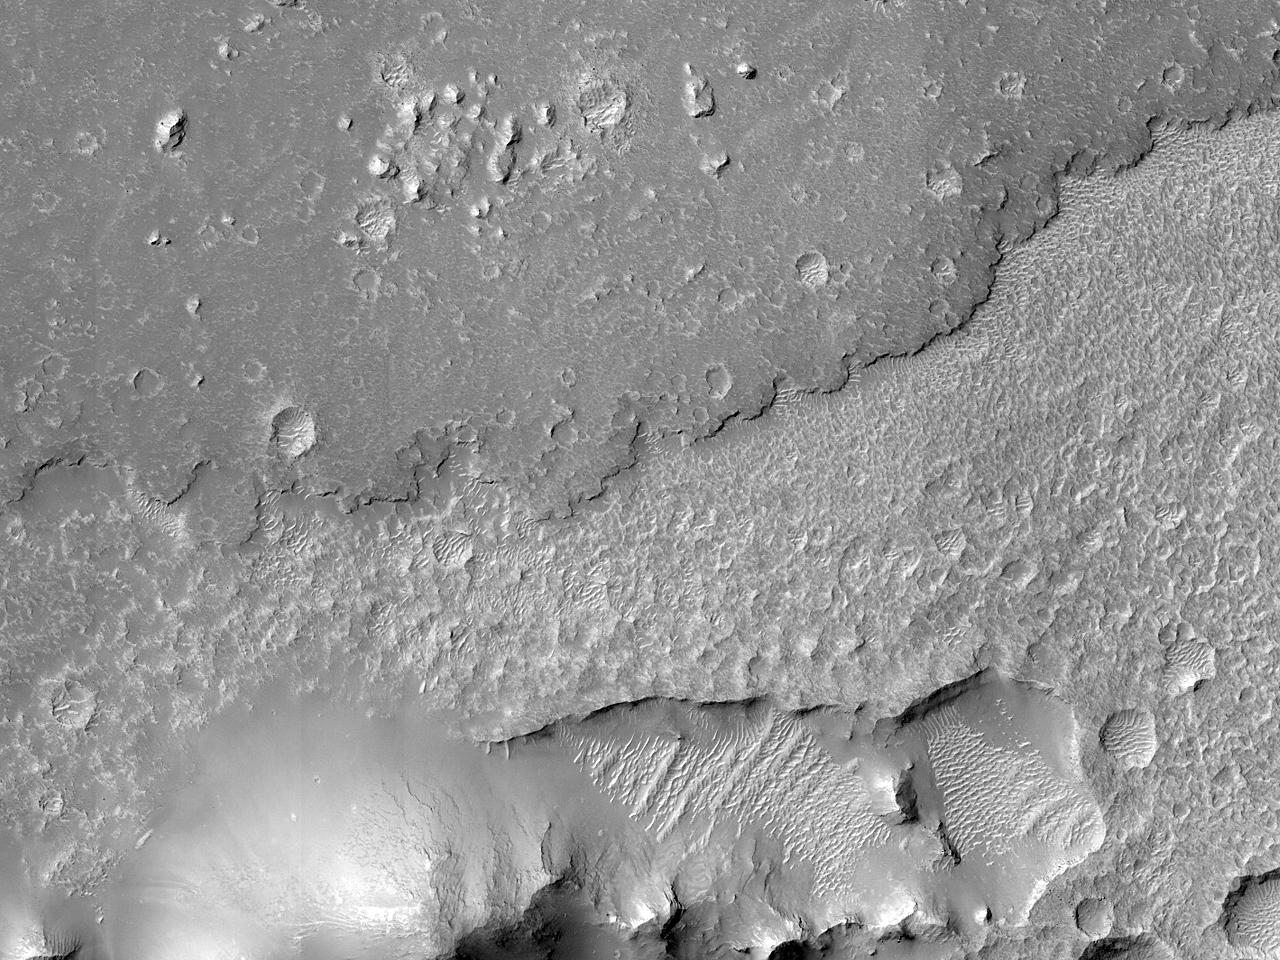 Поток лавы в кратер